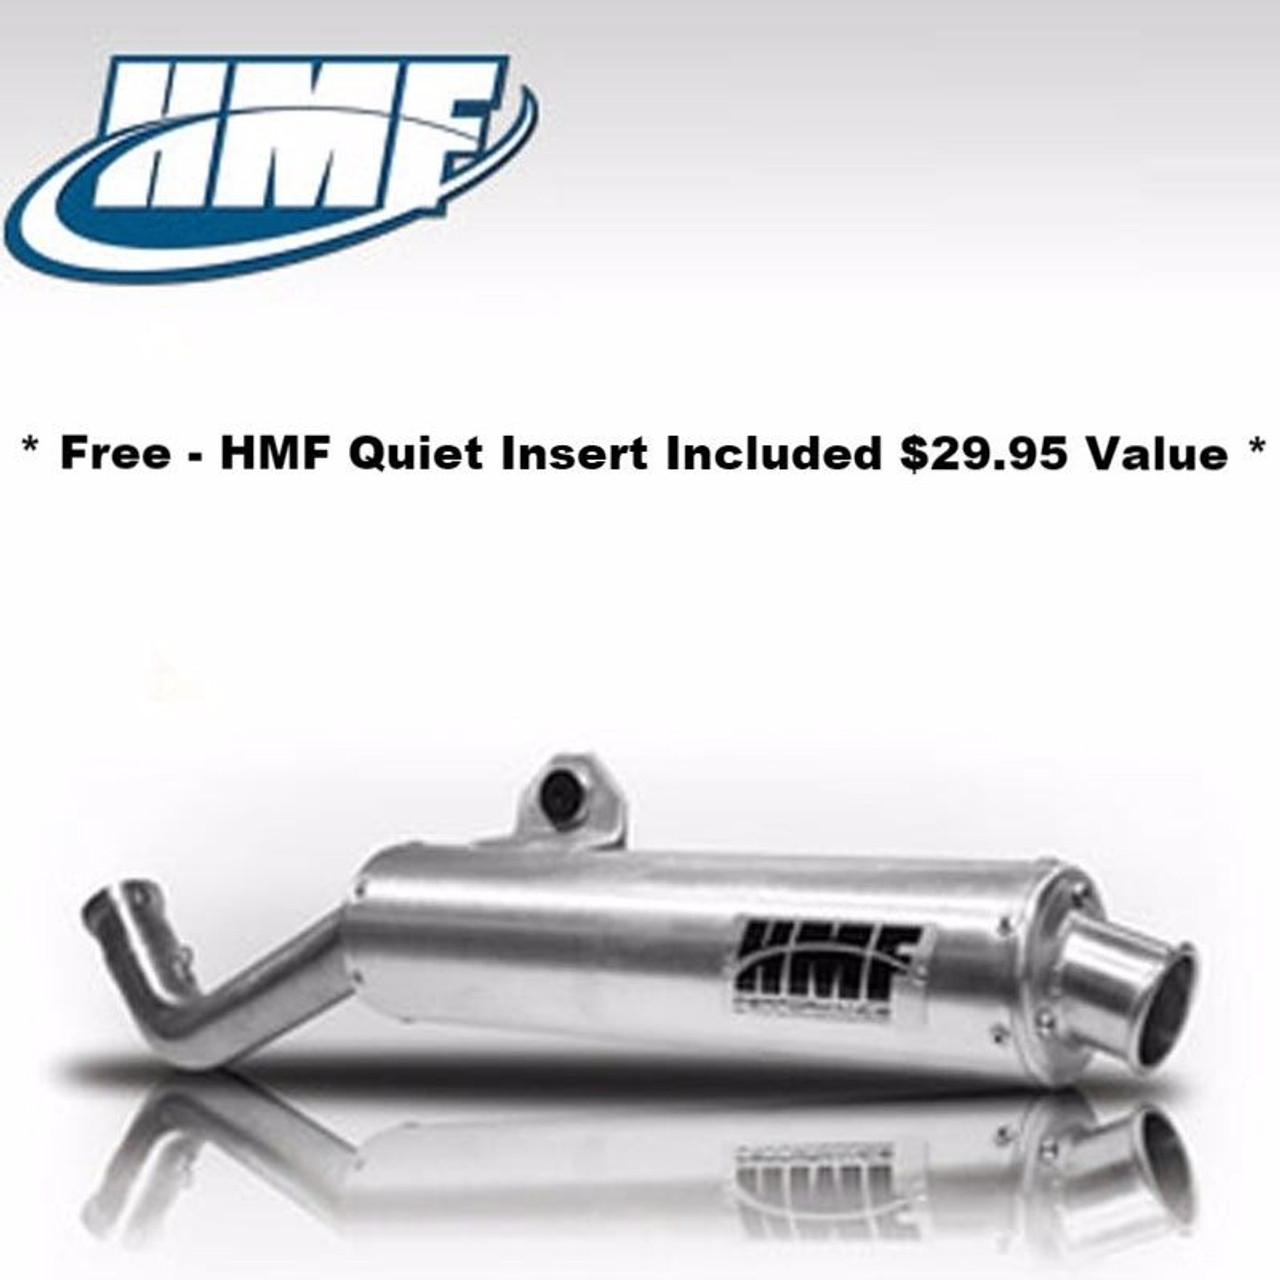 HMF 041373606071 Performance Exhaust Yamaha Warrior